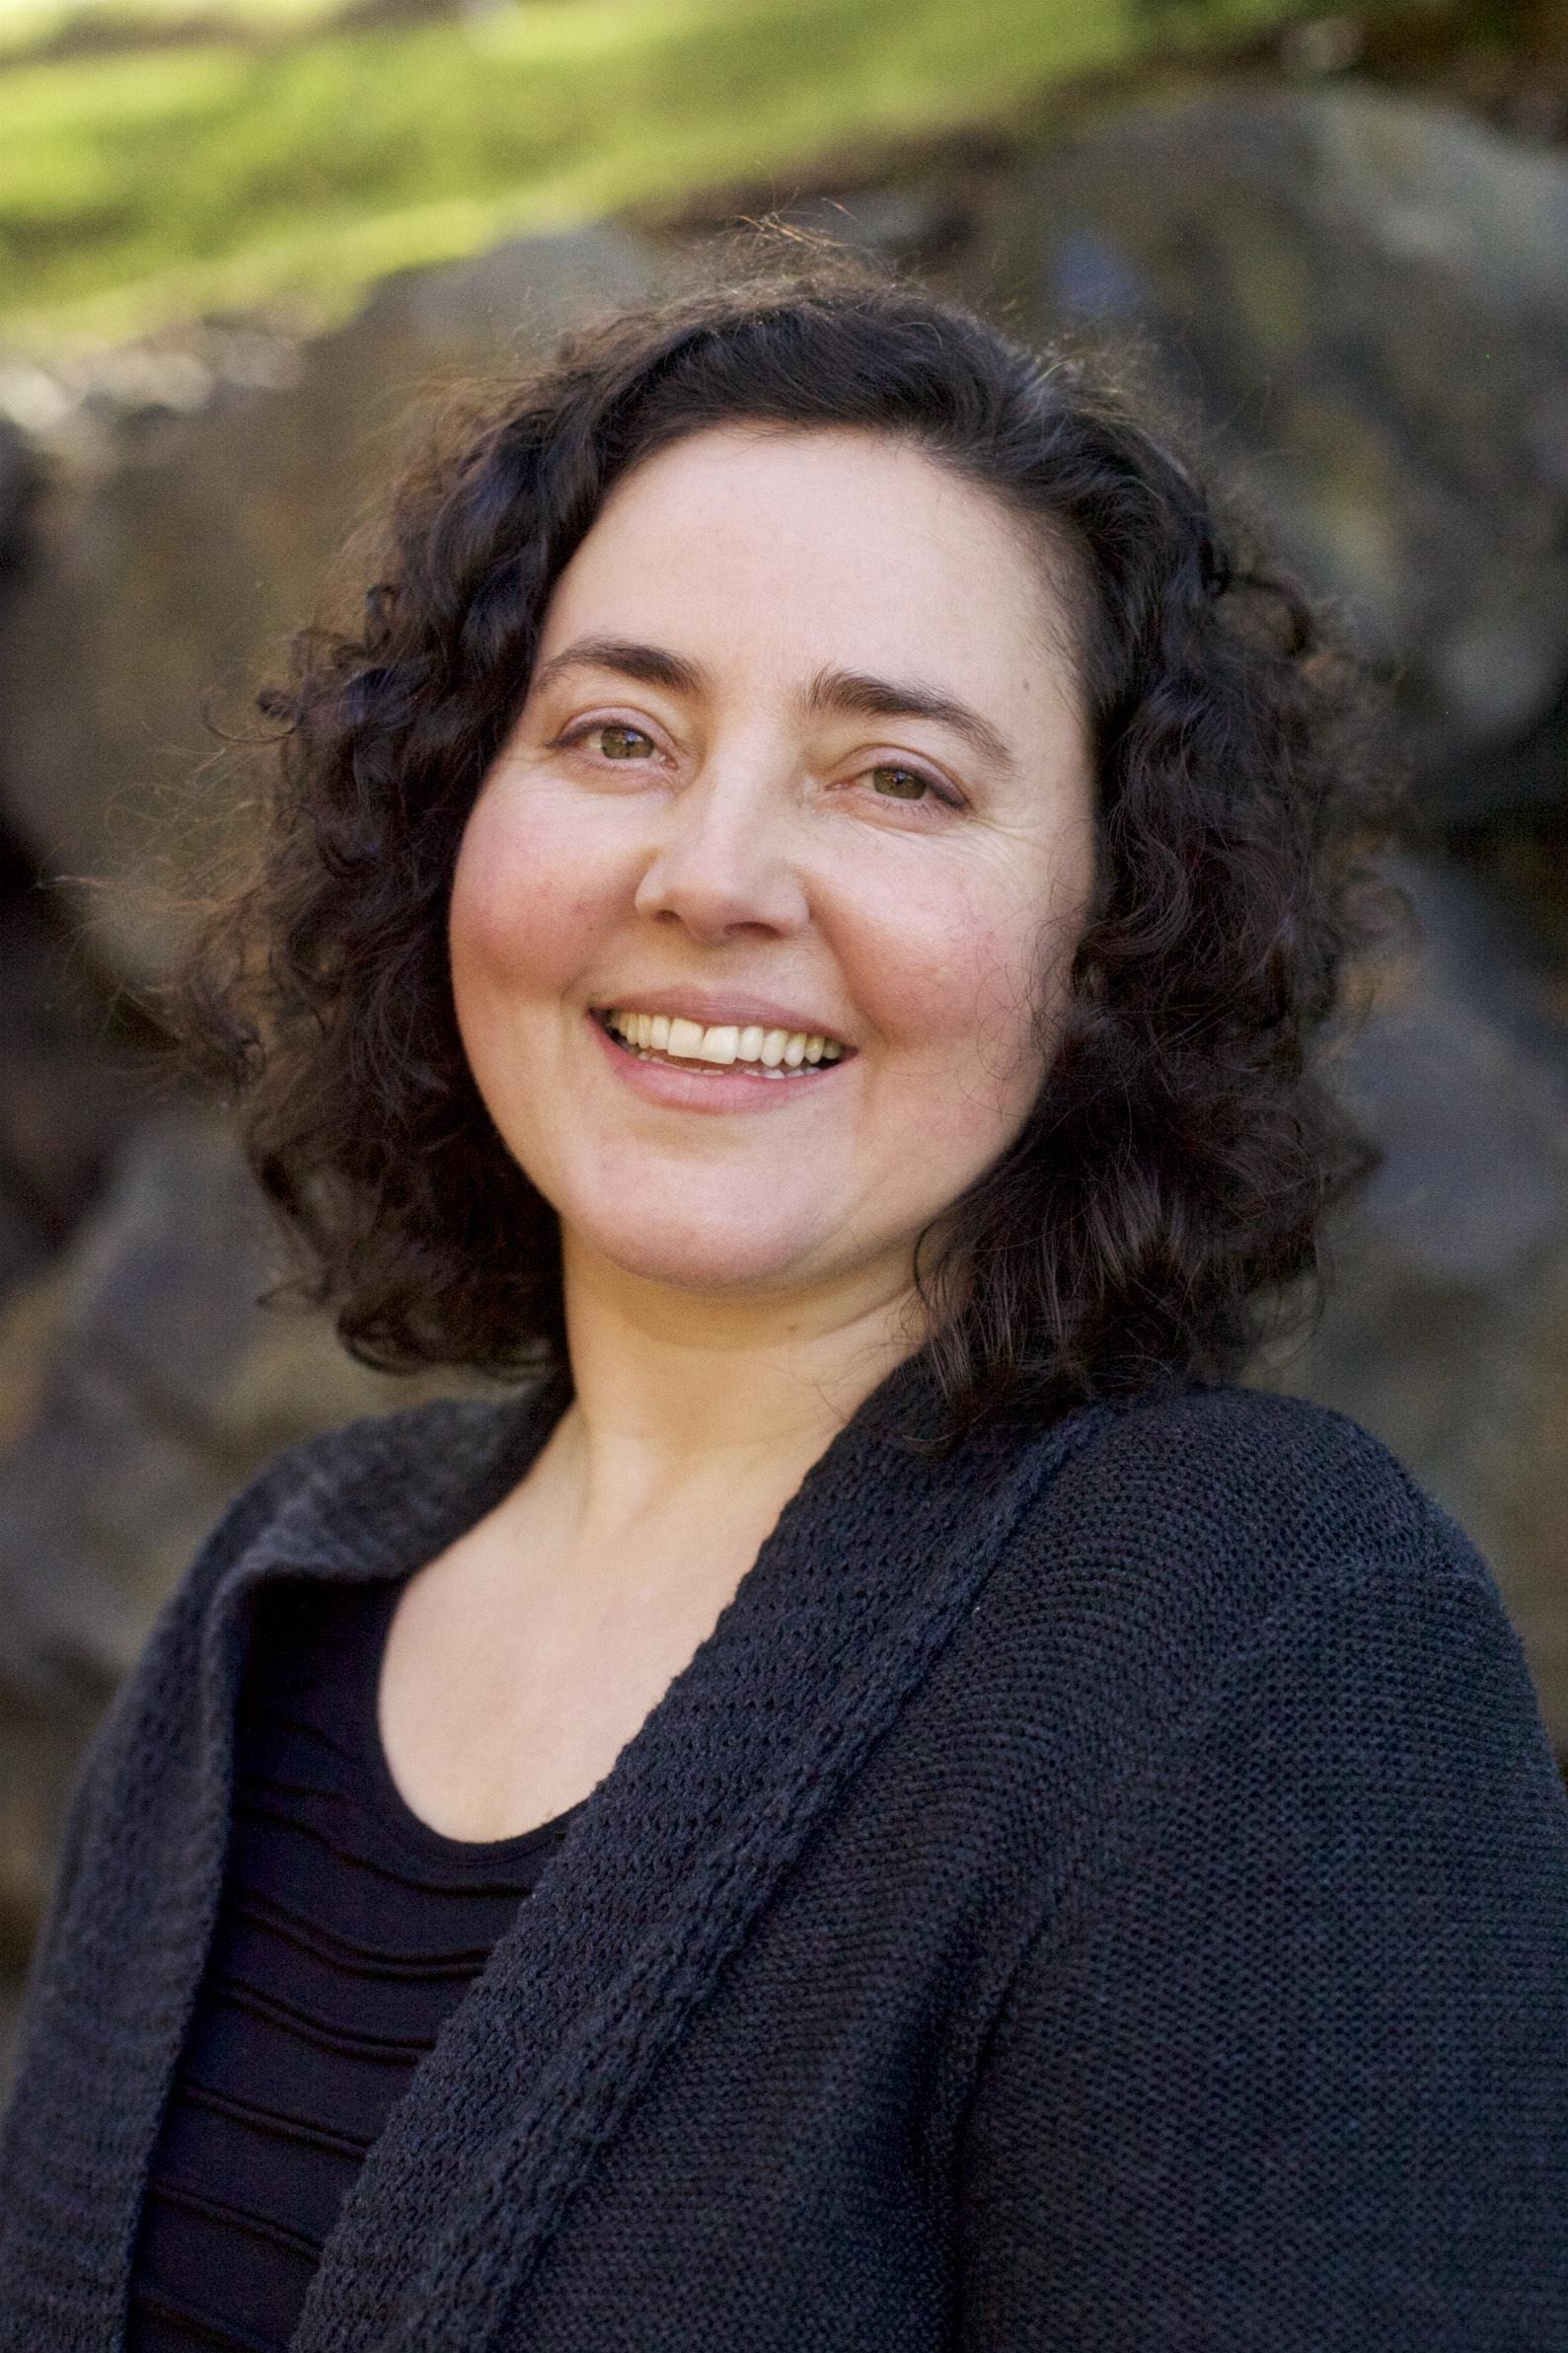 Jennifer Kittleson, MA, LMHC